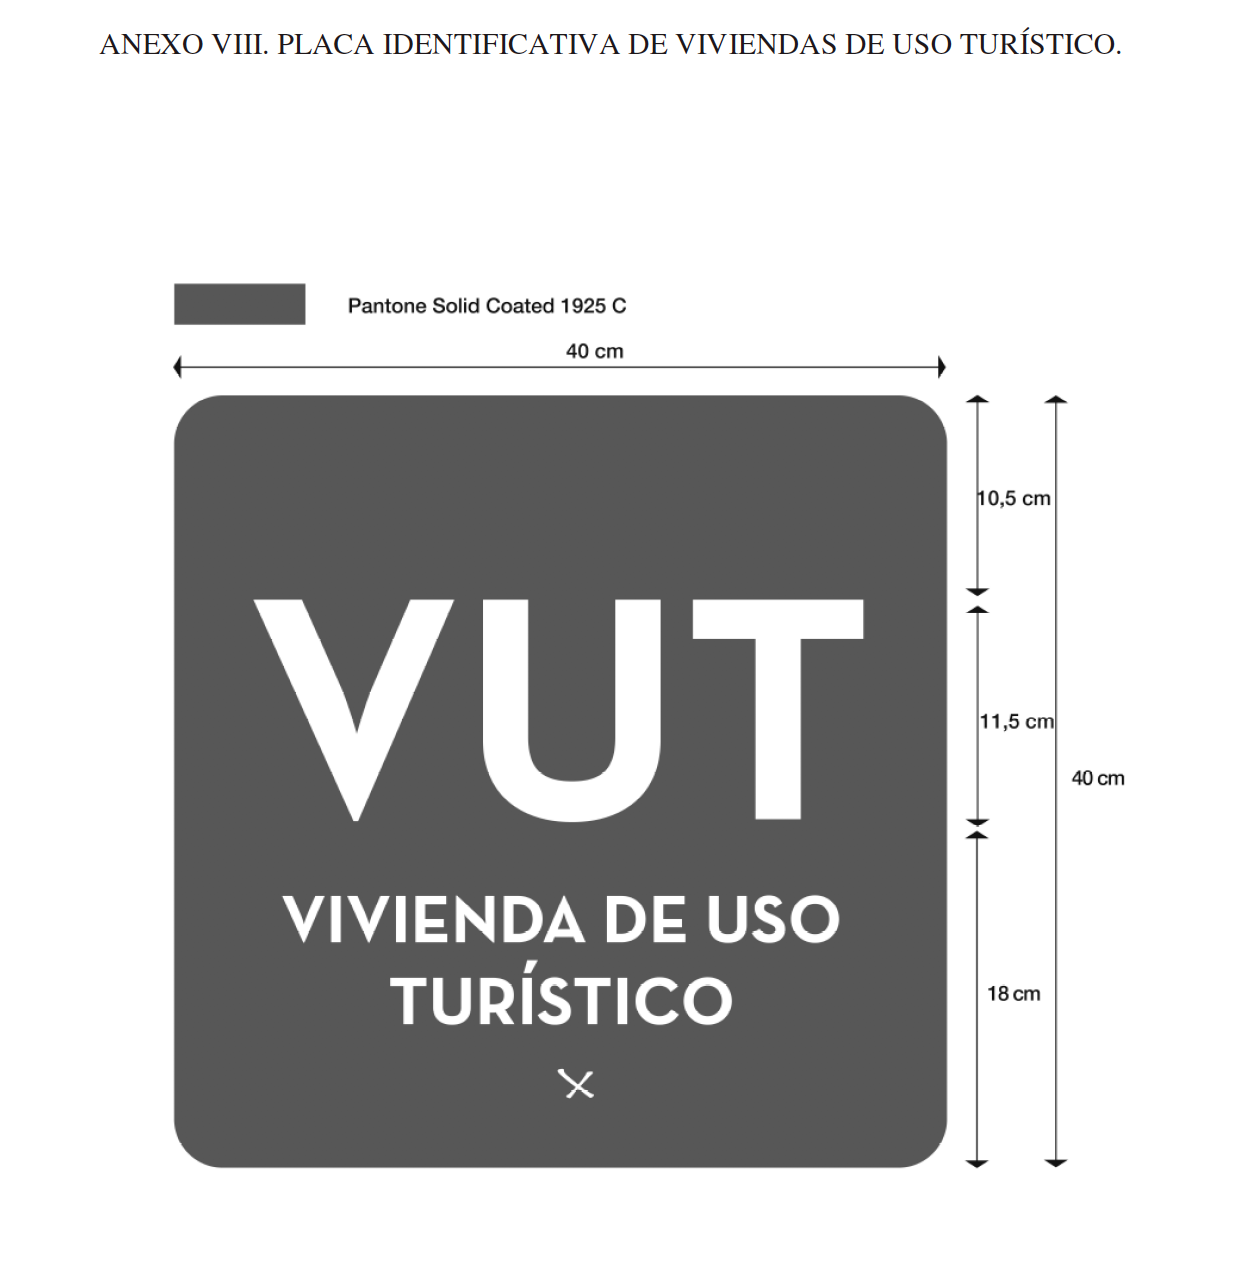 Castilla-La Mancha: Placa identificativa de viviendas de uso turístico (VUT)